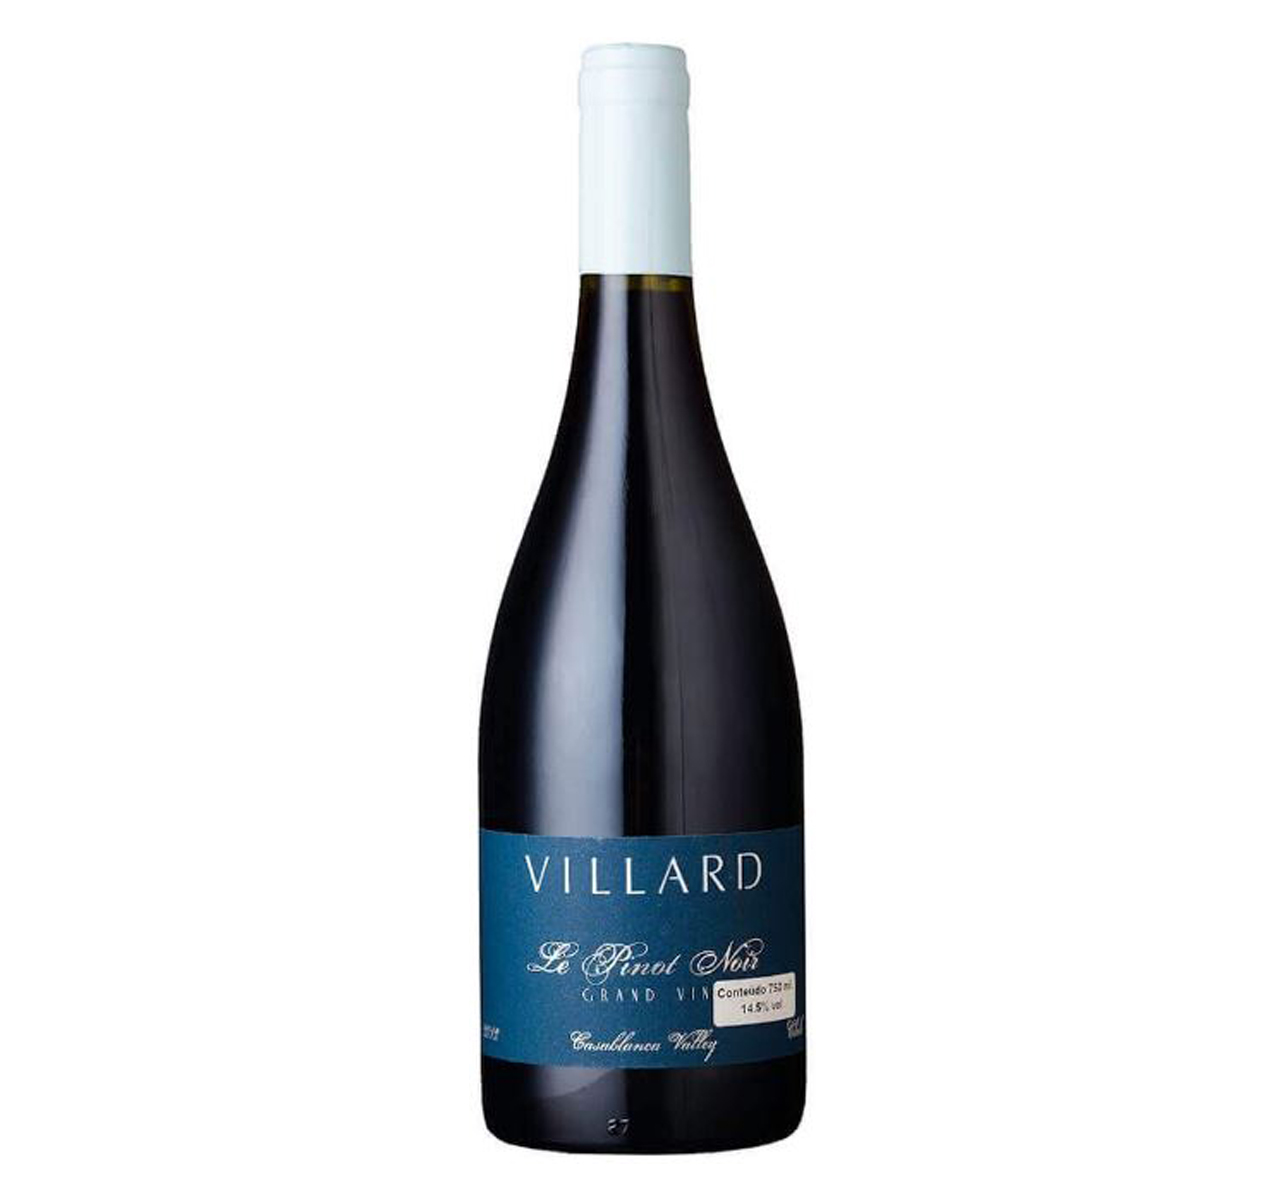 Villard Le Pinot Noir Gran Vin